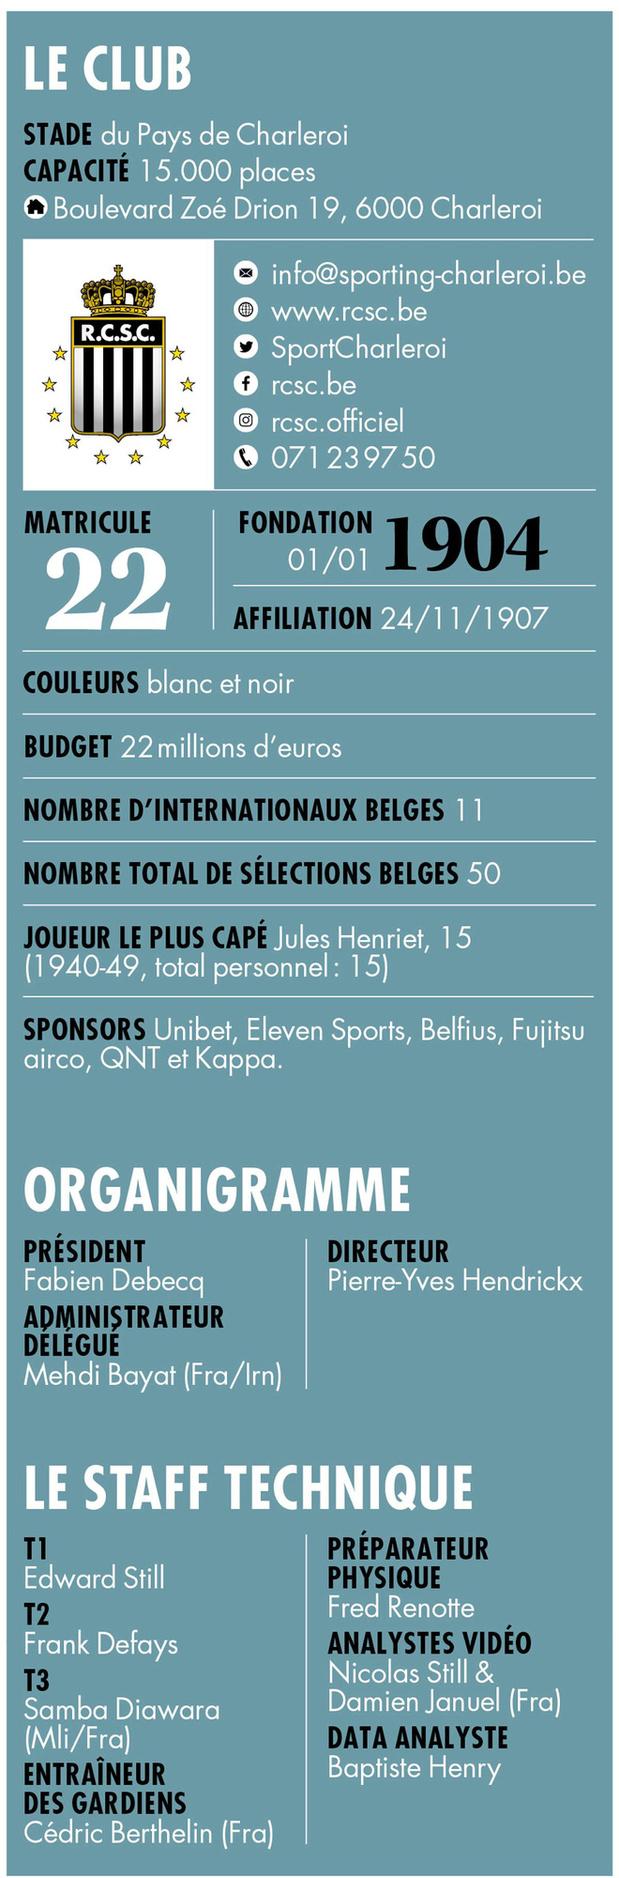 RCS Charleroi - Infos